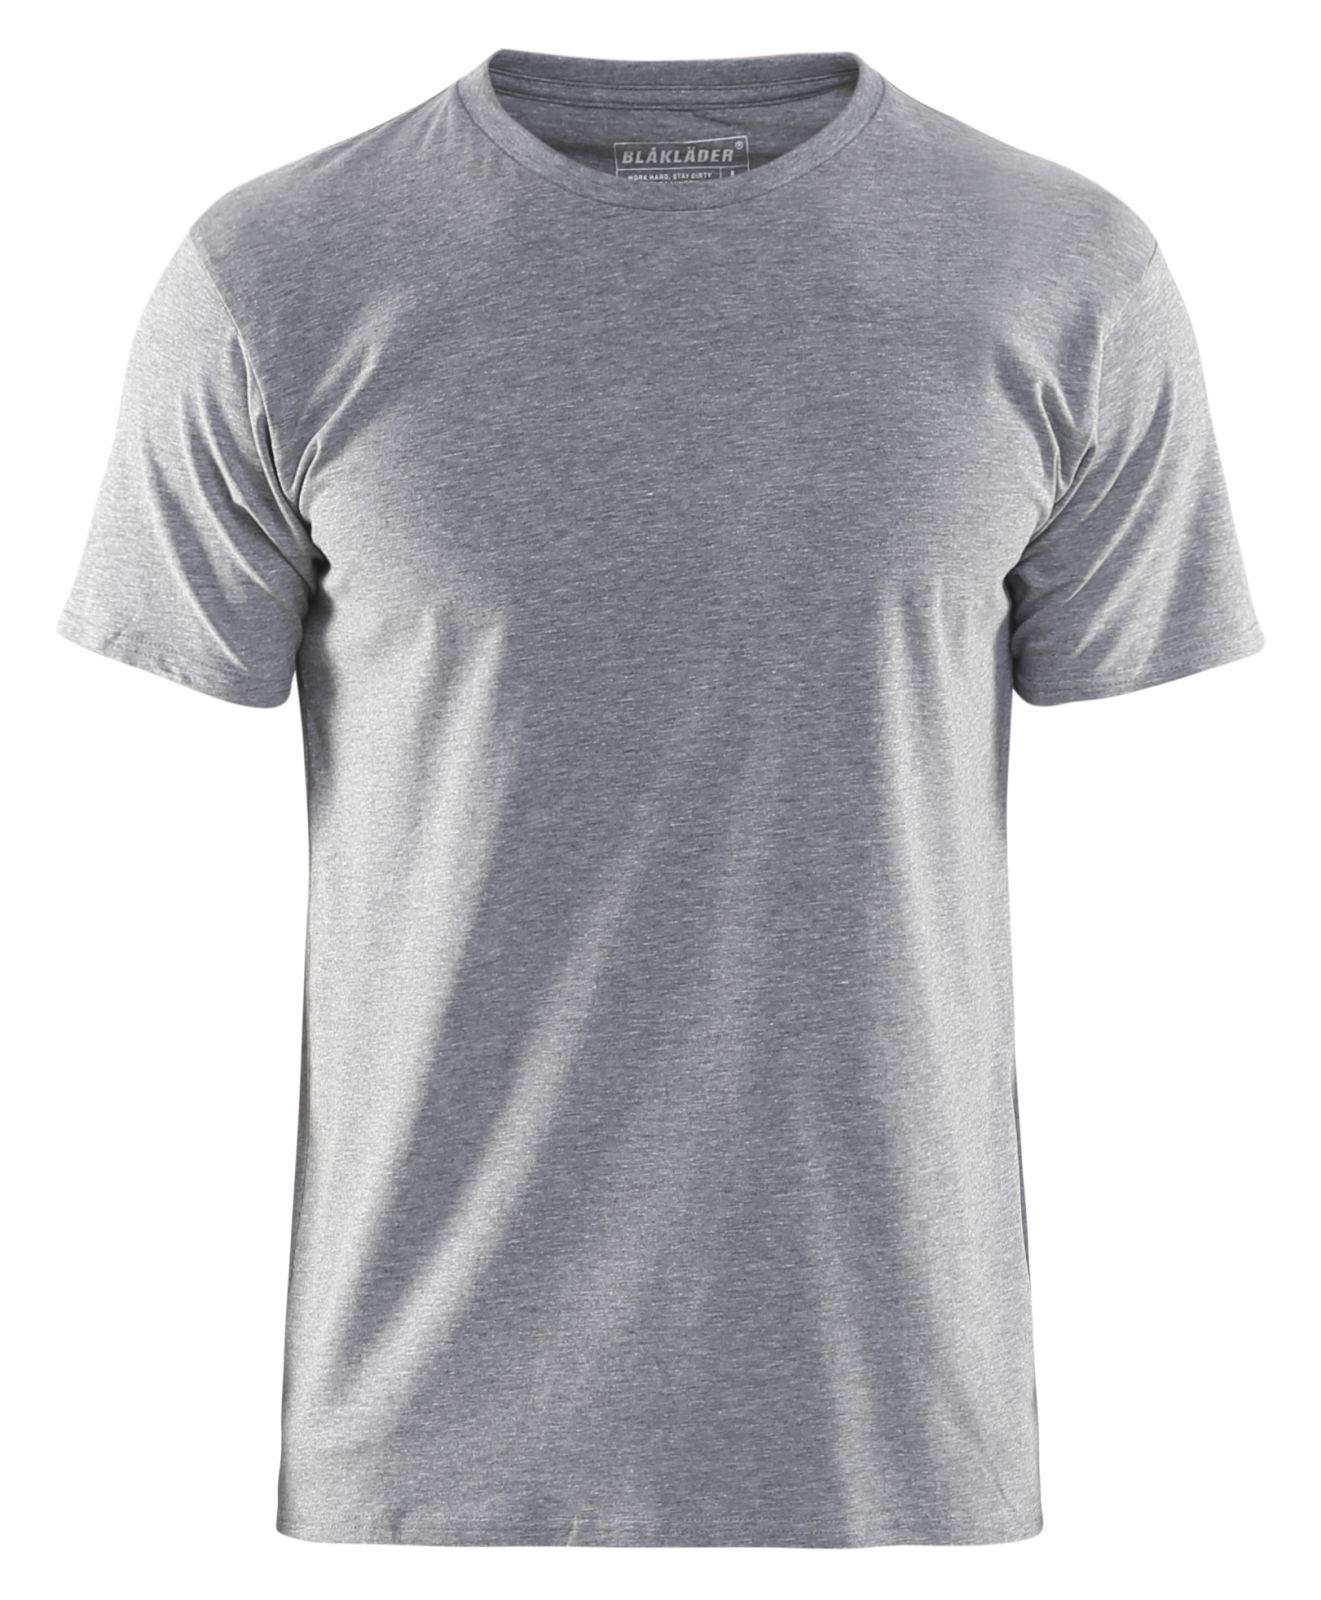 Blaklader T-shirts 35331059 grijs melee(9000)